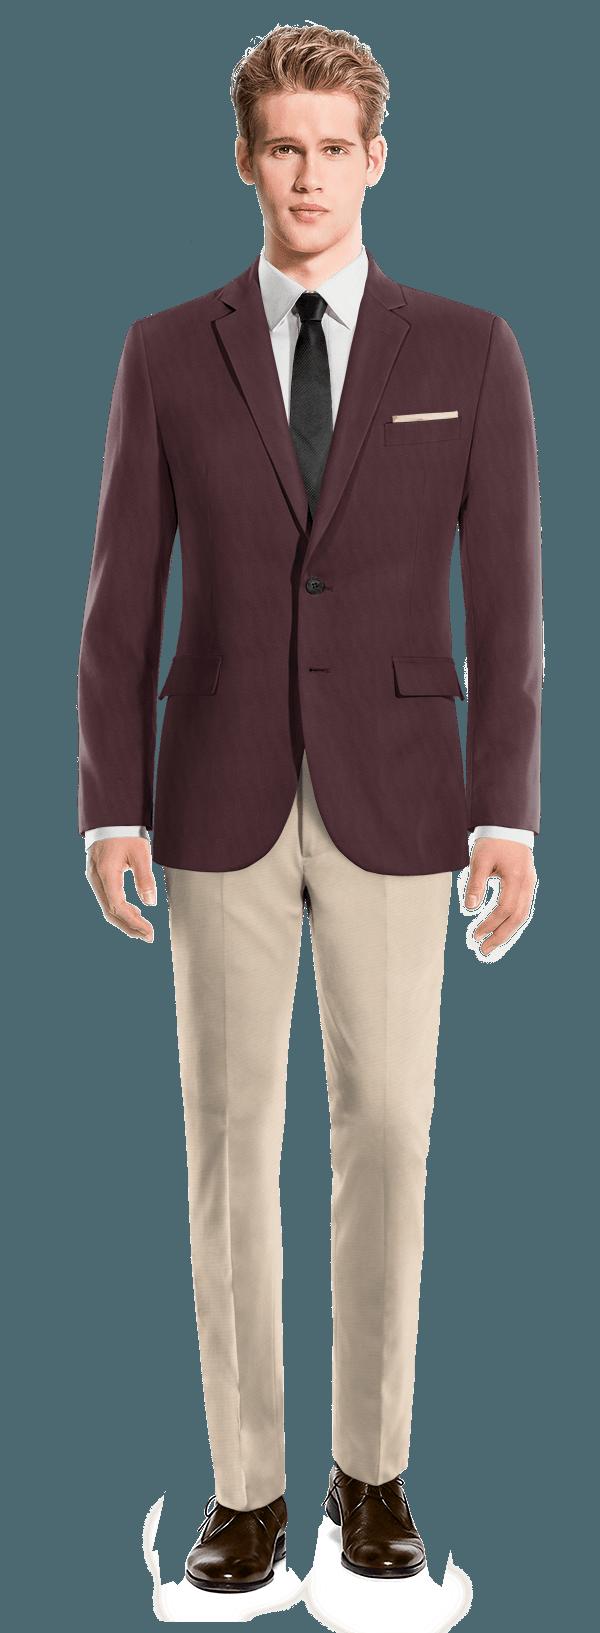 veste rouge en laine et pantalon beige en laine 242 mulberry wine hockerty. Black Bedroom Furniture Sets. Home Design Ideas